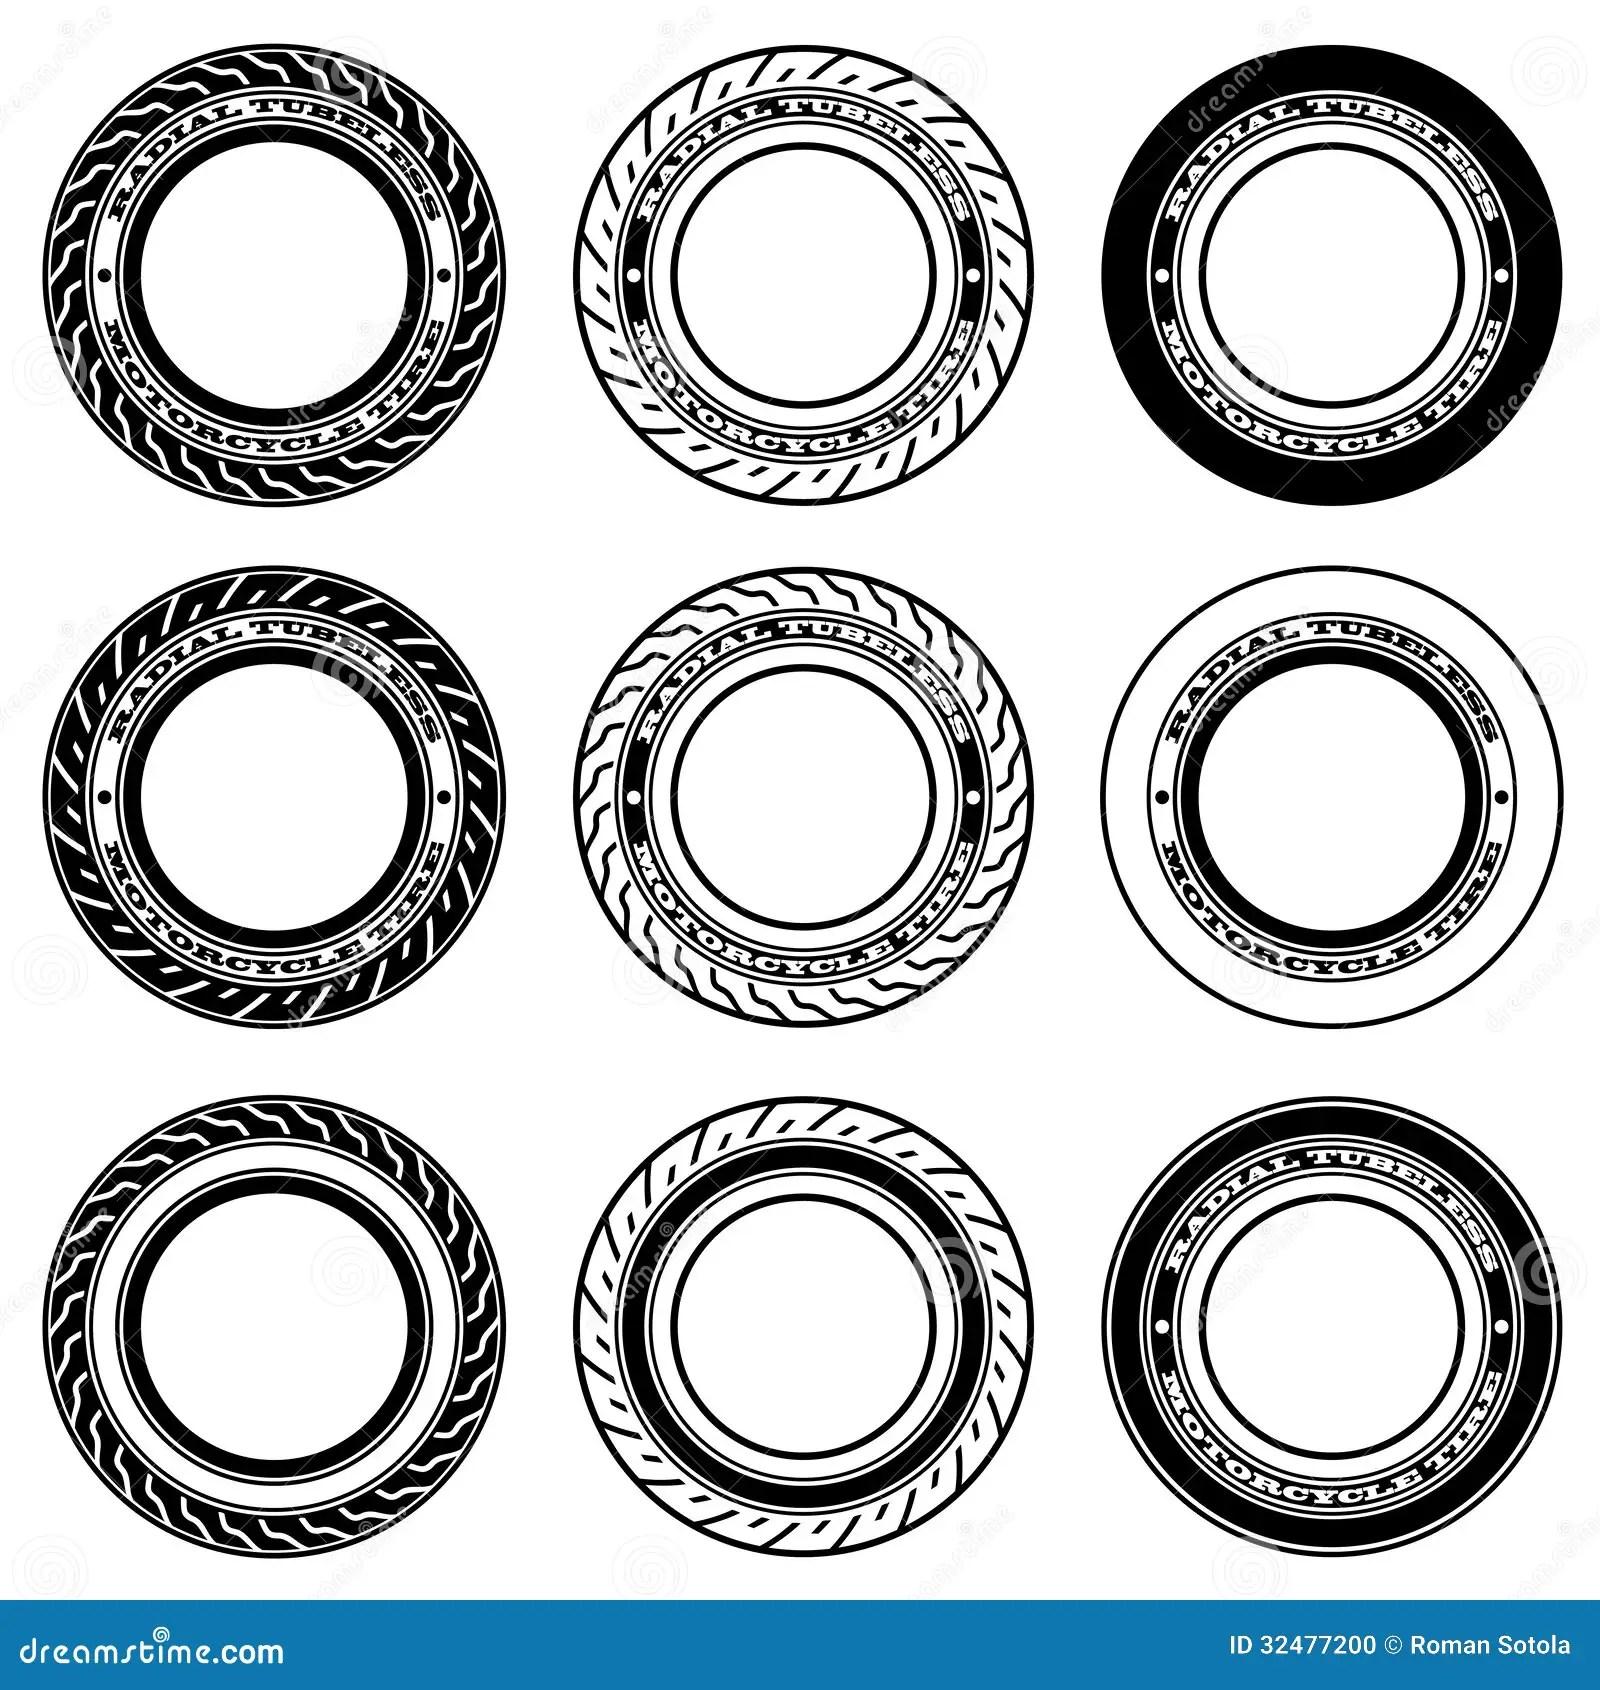 Radial Tubeless Motorcycle Tyre Symbols Stock Photo